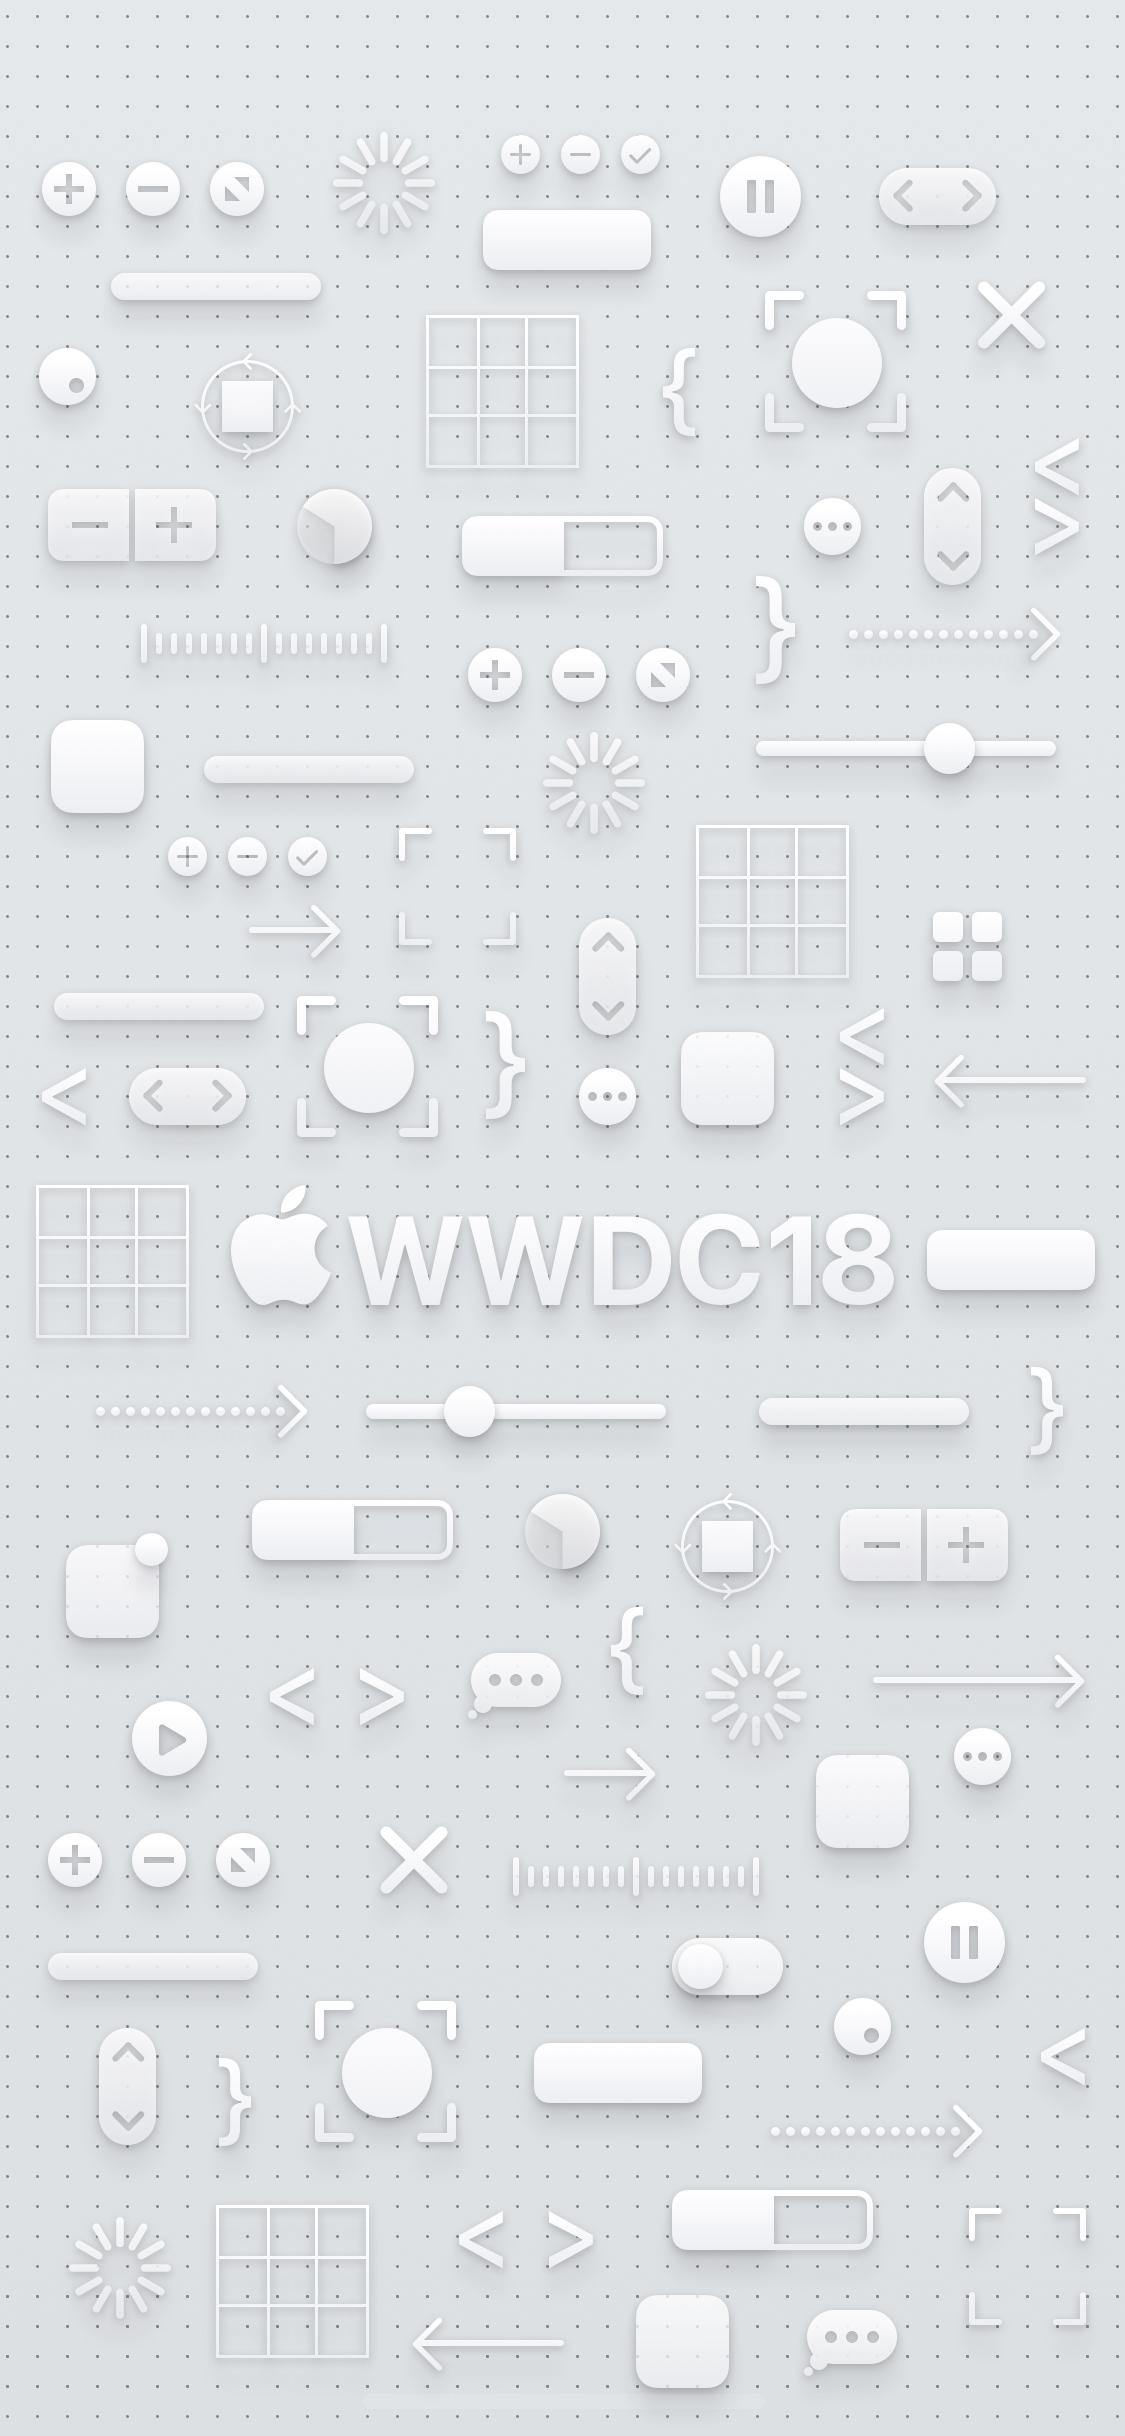 Wwdc 18デザインのiphone用壁紙が公開 Iphone Mania